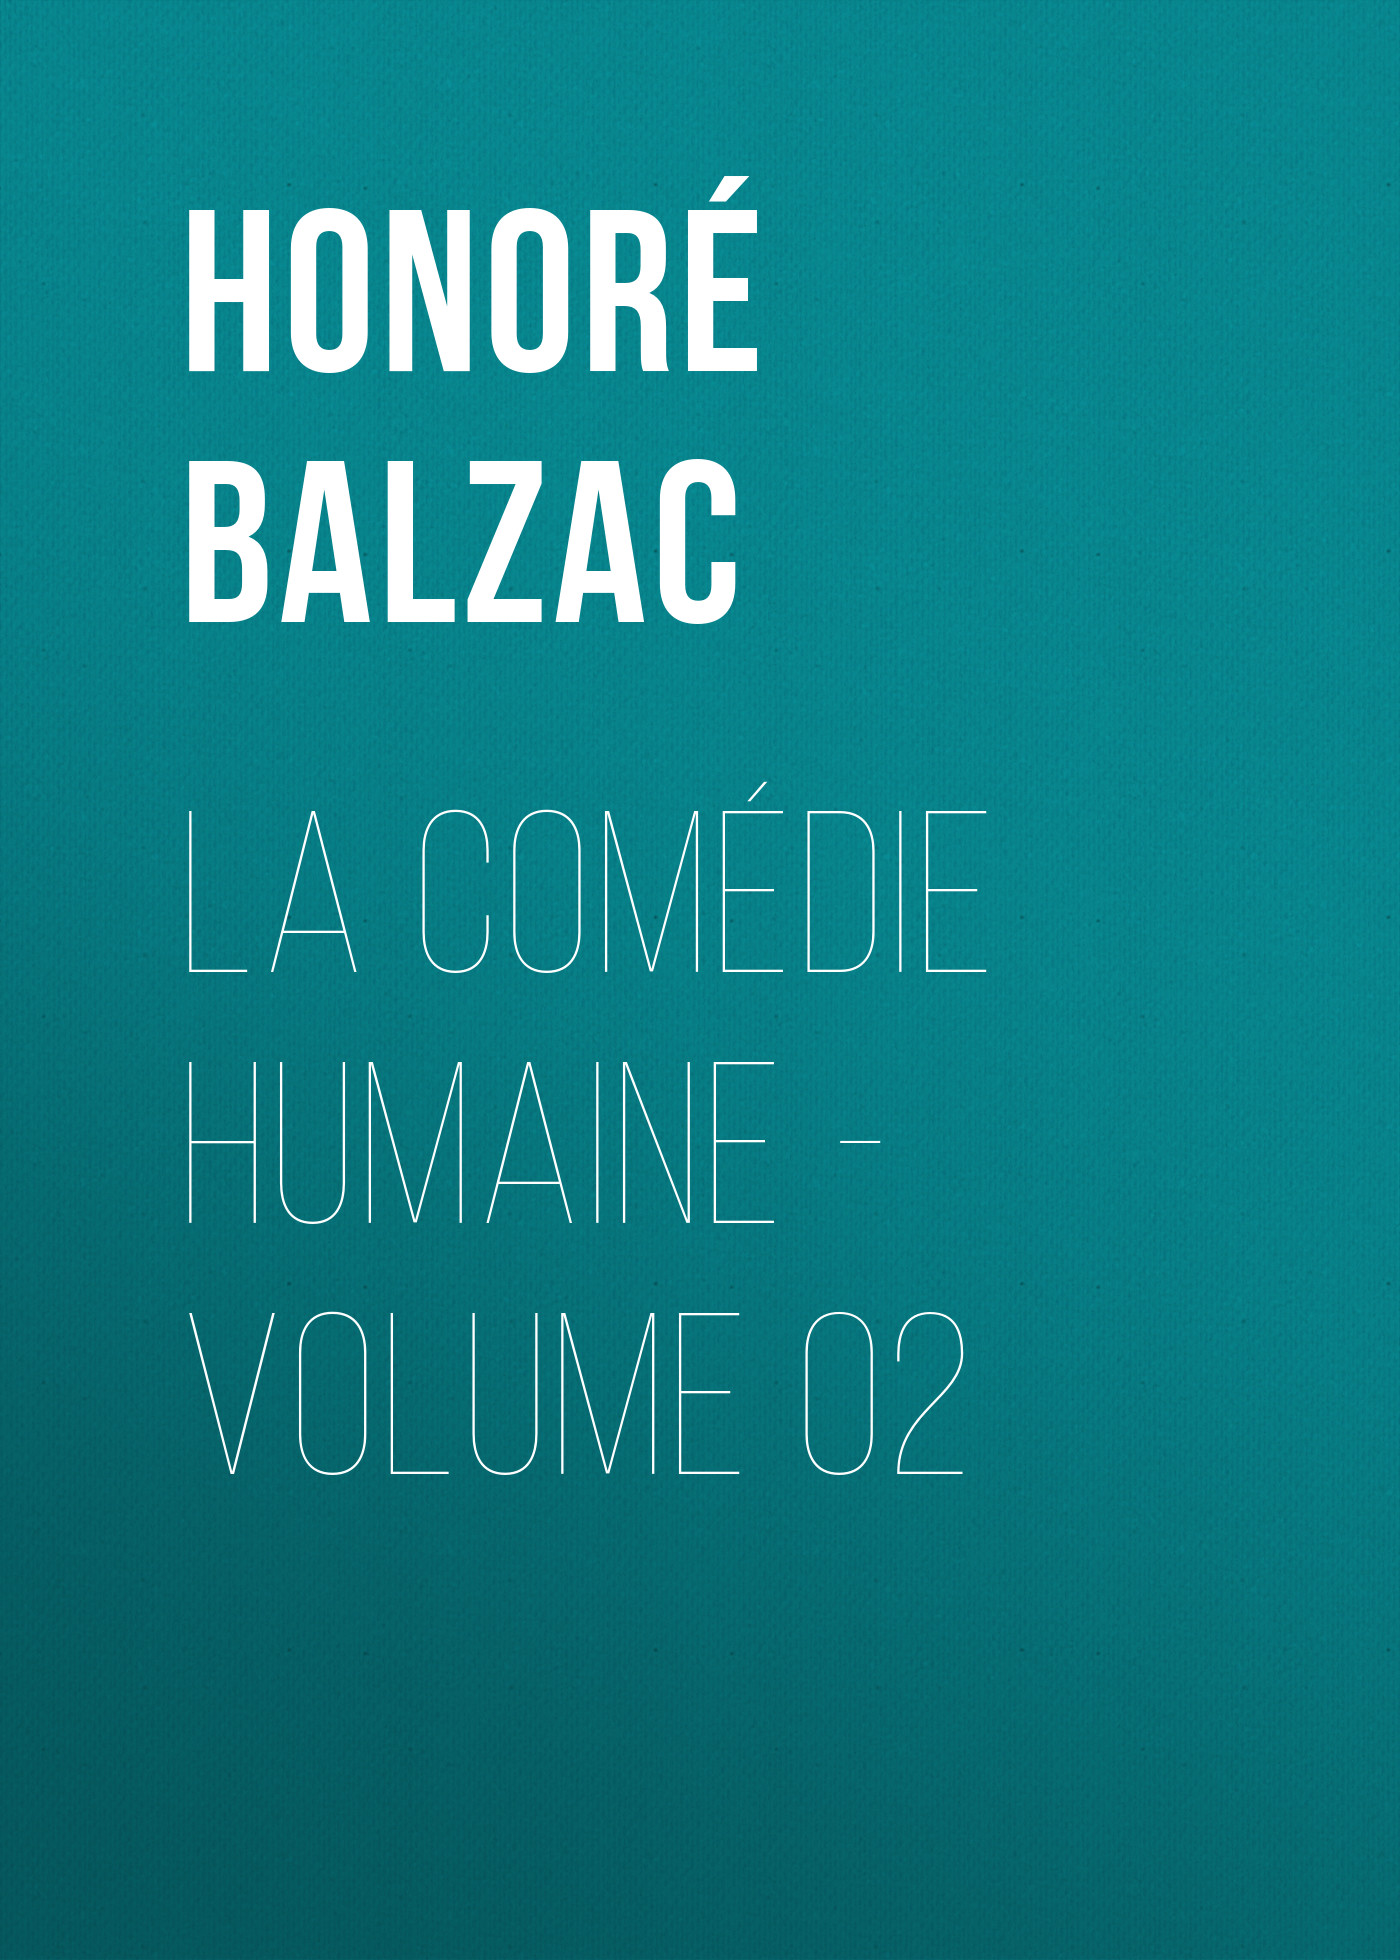 la comedie humaine volume 02